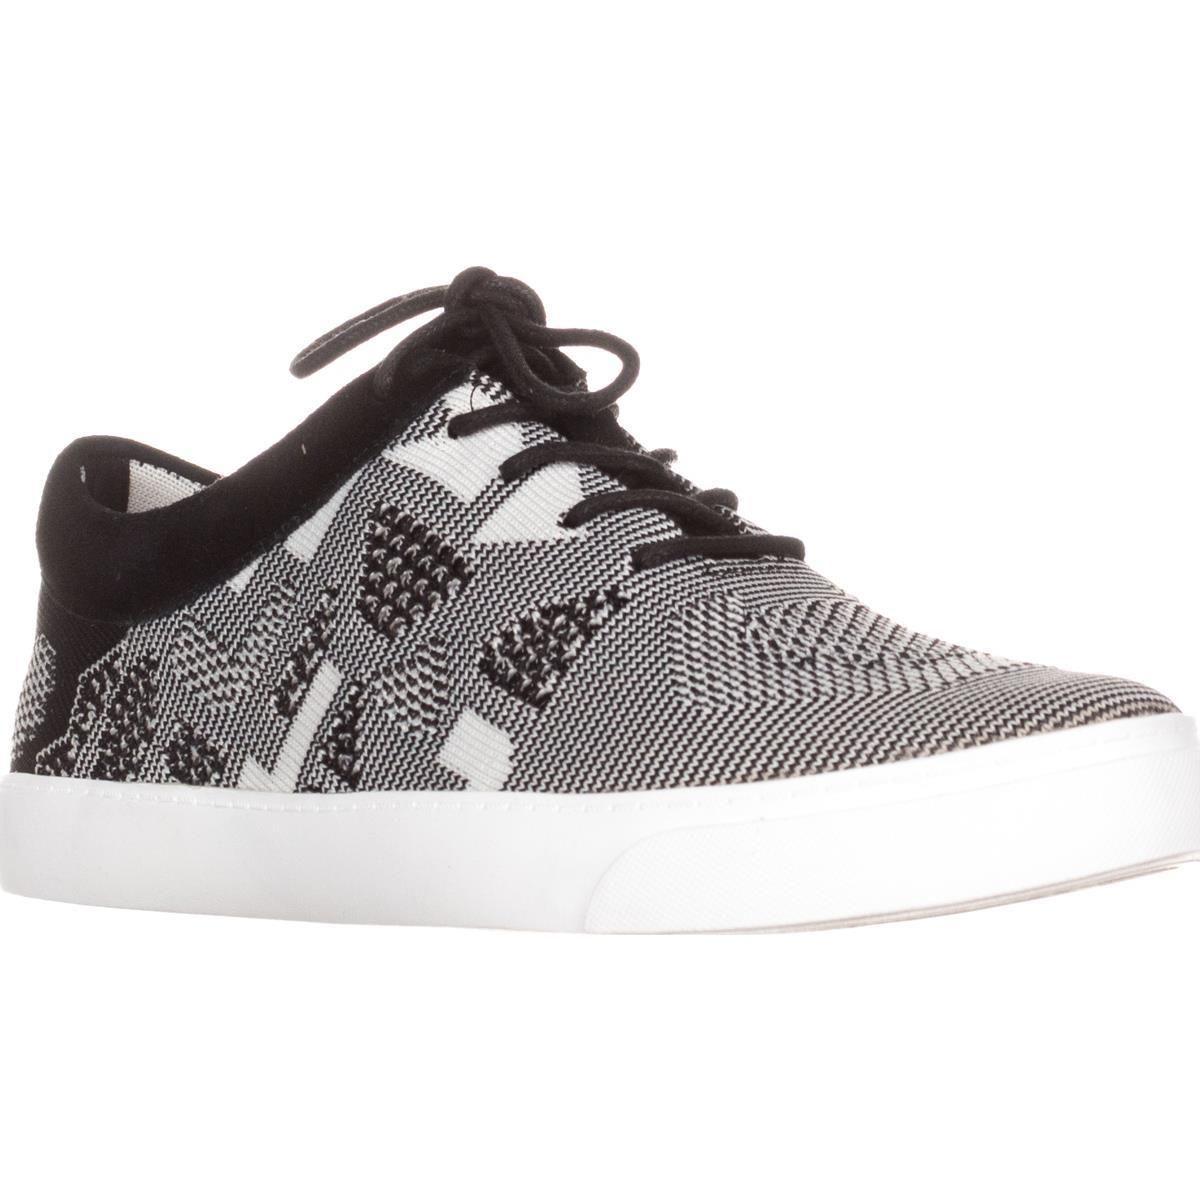 fc260f5e8601 Clarks Glove Glitter Comfort Sneakers in Black - Save 10% - Lyst